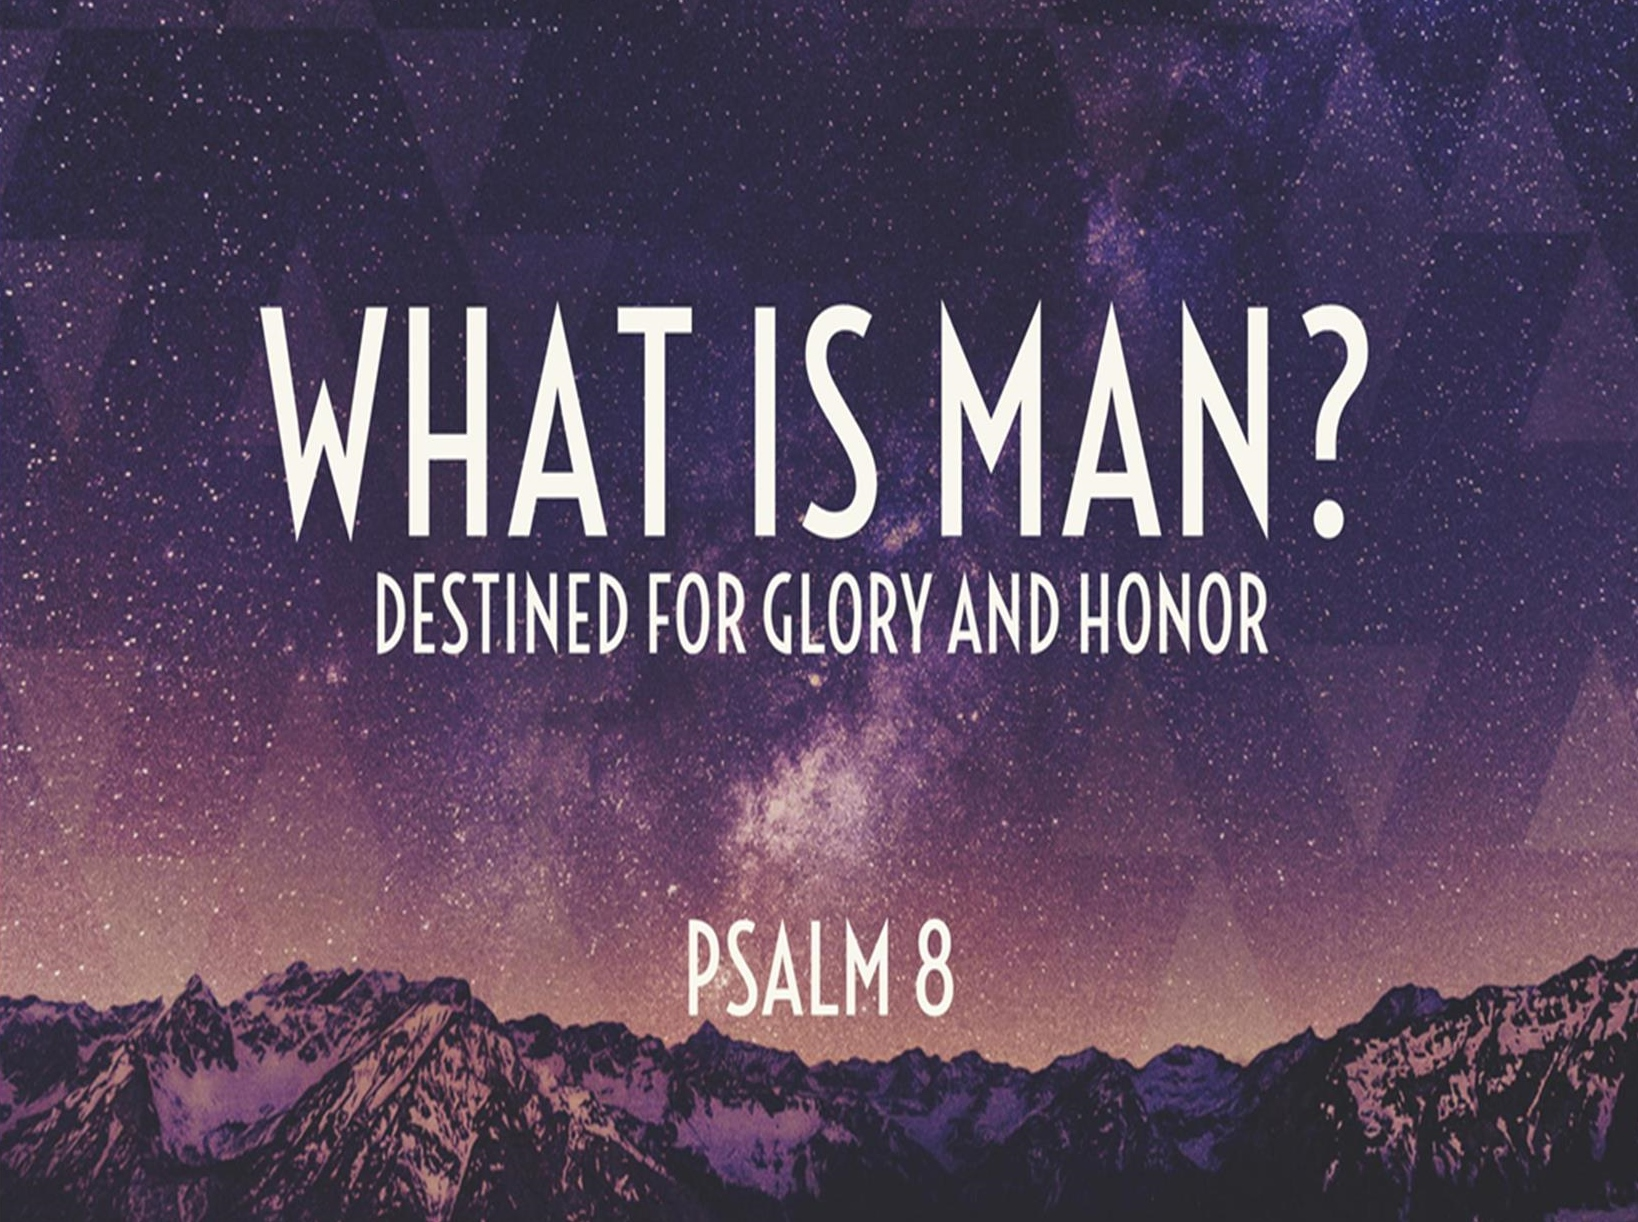 November 20, 2016 ~ What is Man? (Psalm 8) ~ Dr. Sam Horn